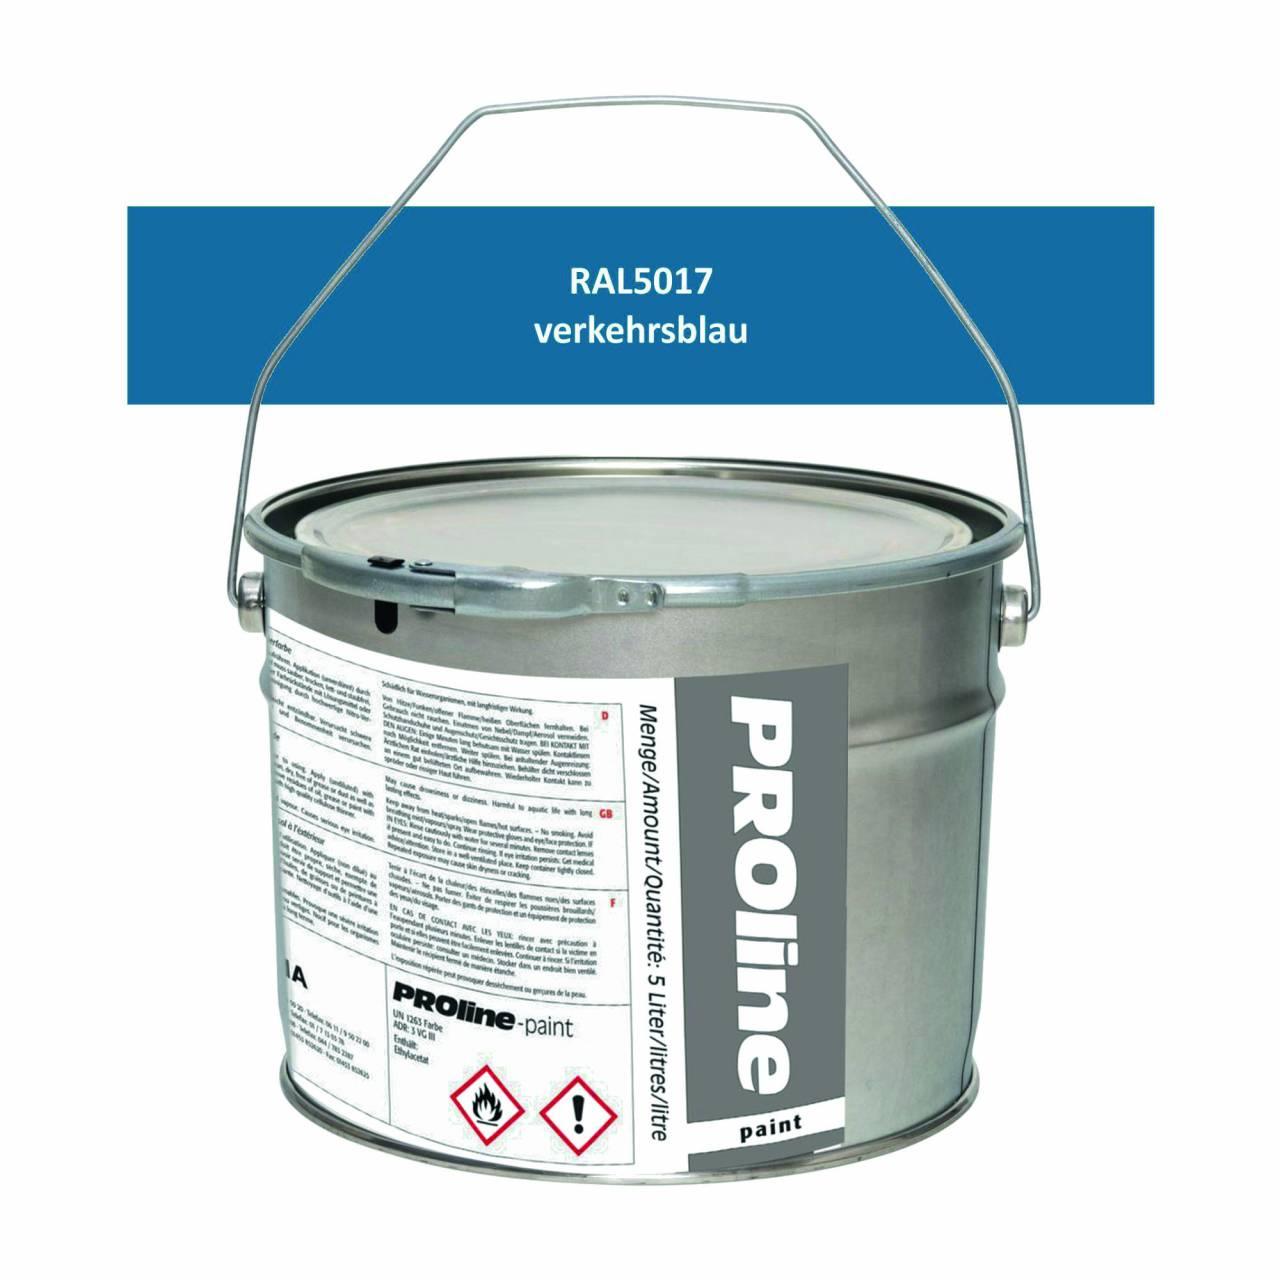 Aussen-Markierfarbe 'PROline-paint' BLAU / Eimer a 5,0 Liter